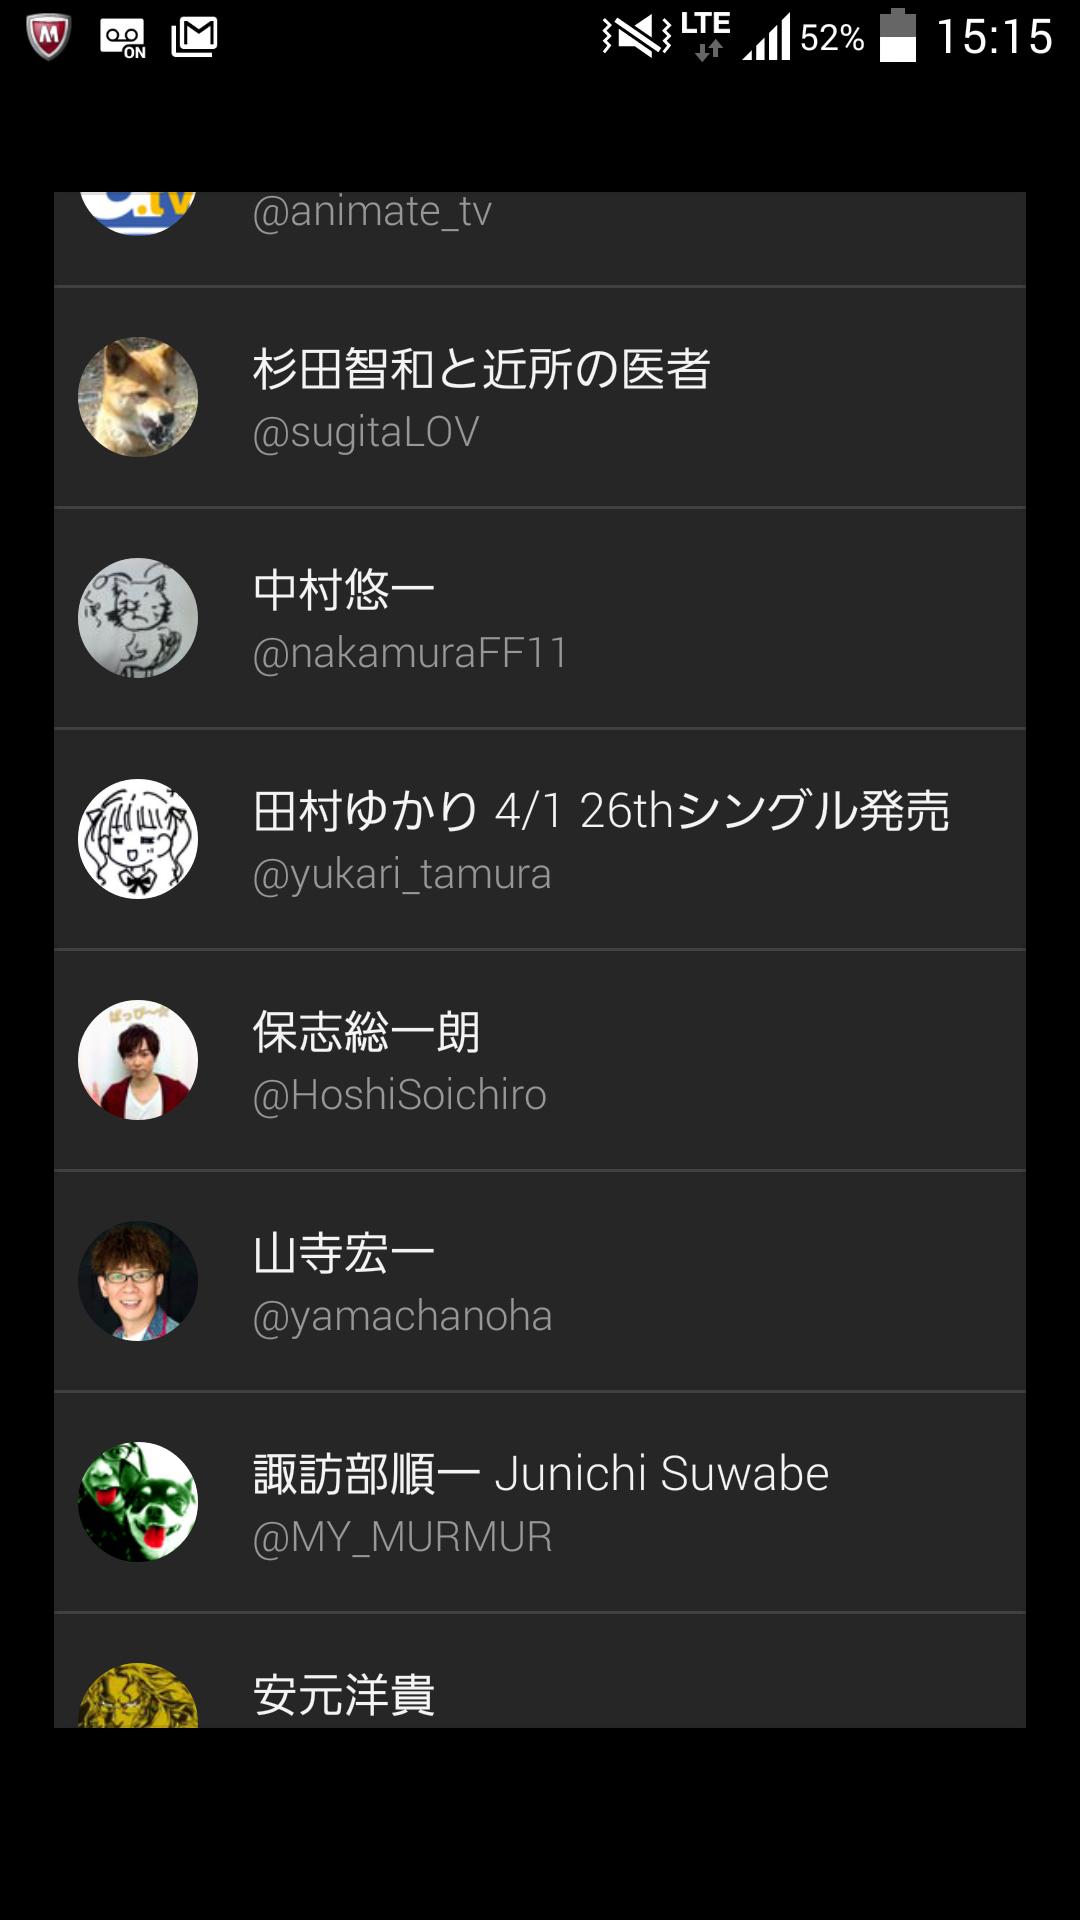 Screenshot_2015-04-14-15-15-53.png